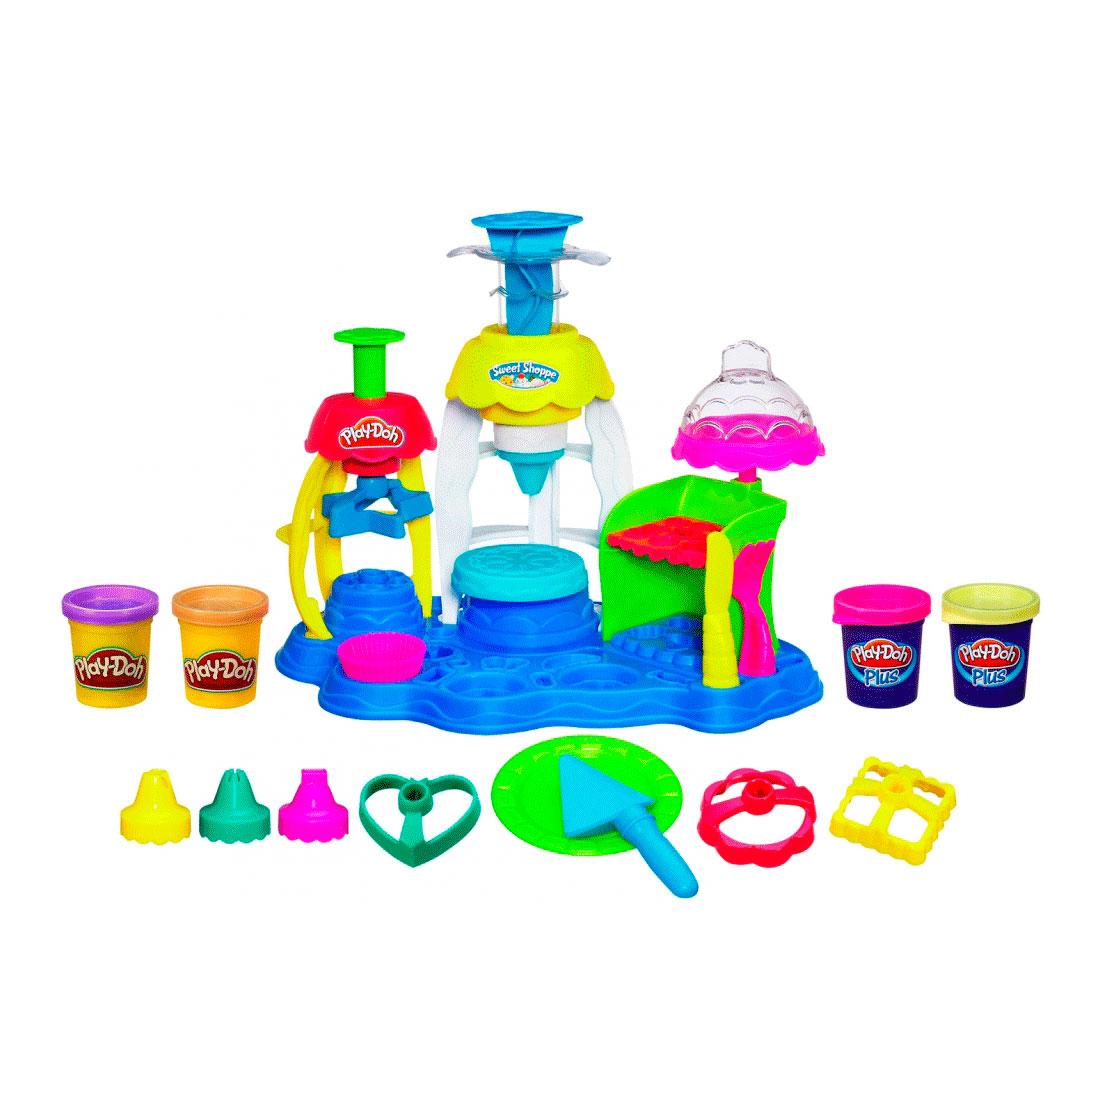 ����� ��� ����� Play-Doh ������� ��������